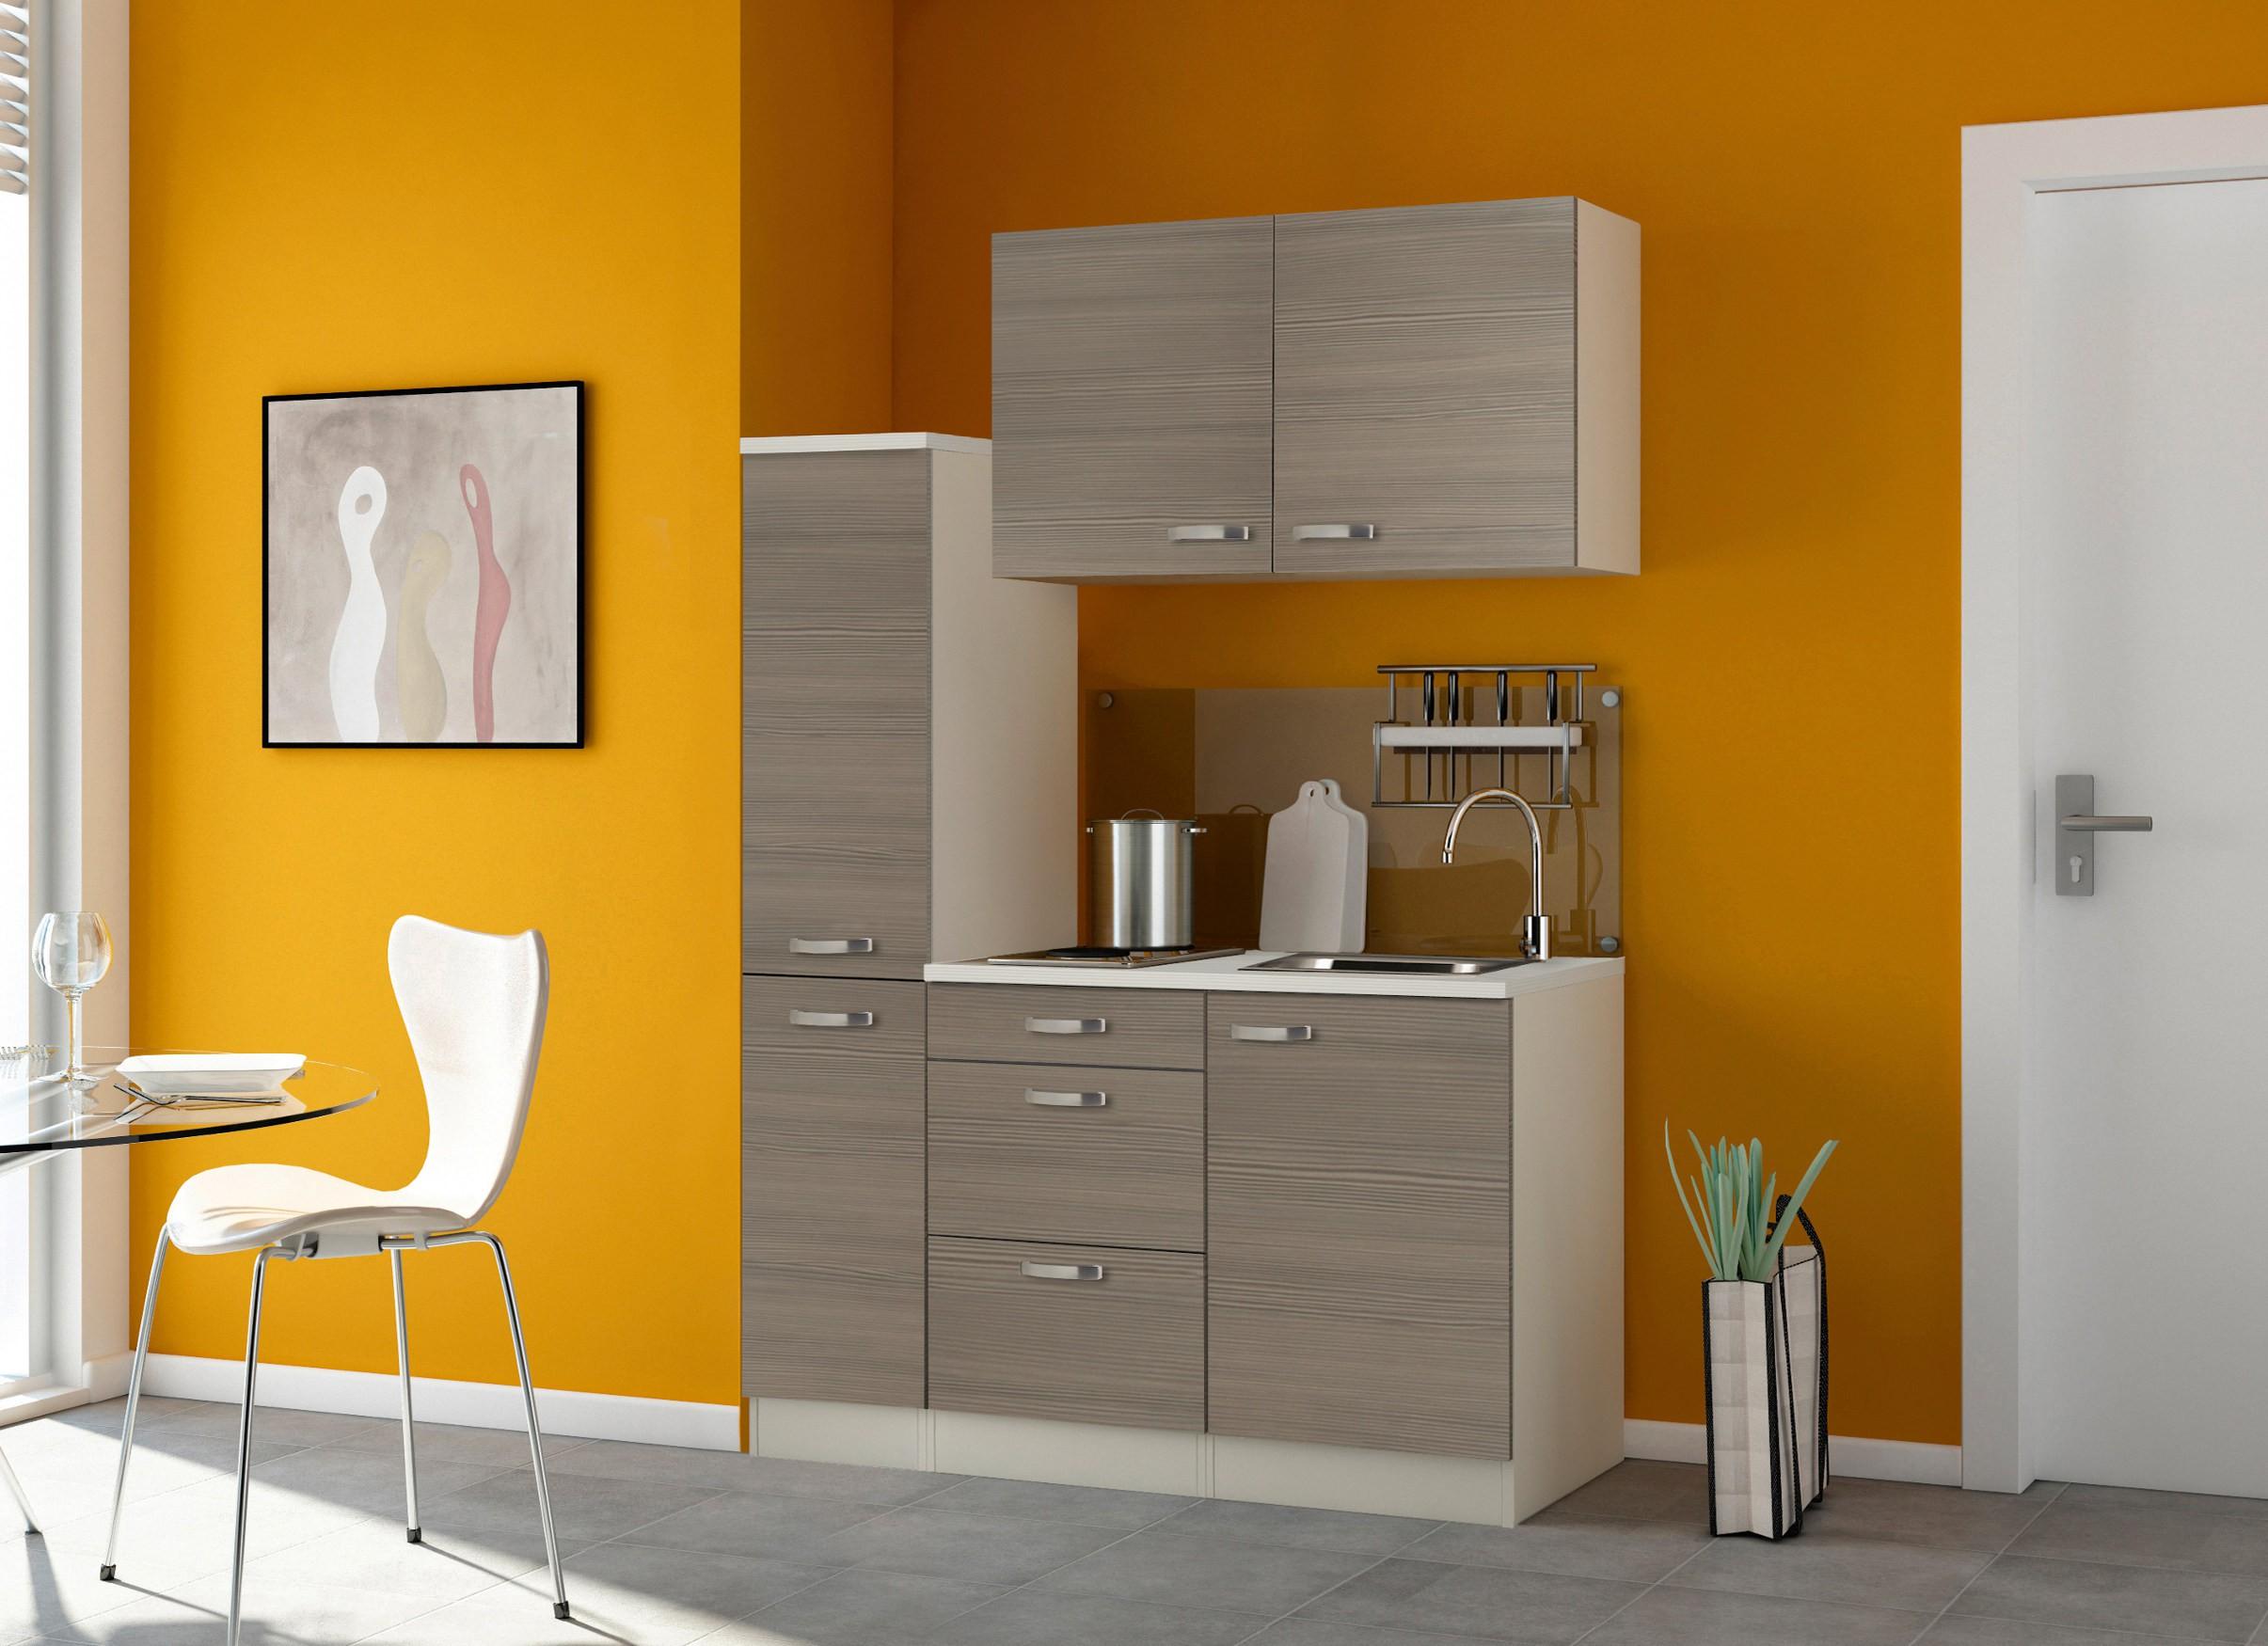 singlek che toledo mit elektro kochfeld breite 130 cm. Black Bedroom Furniture Sets. Home Design Ideas